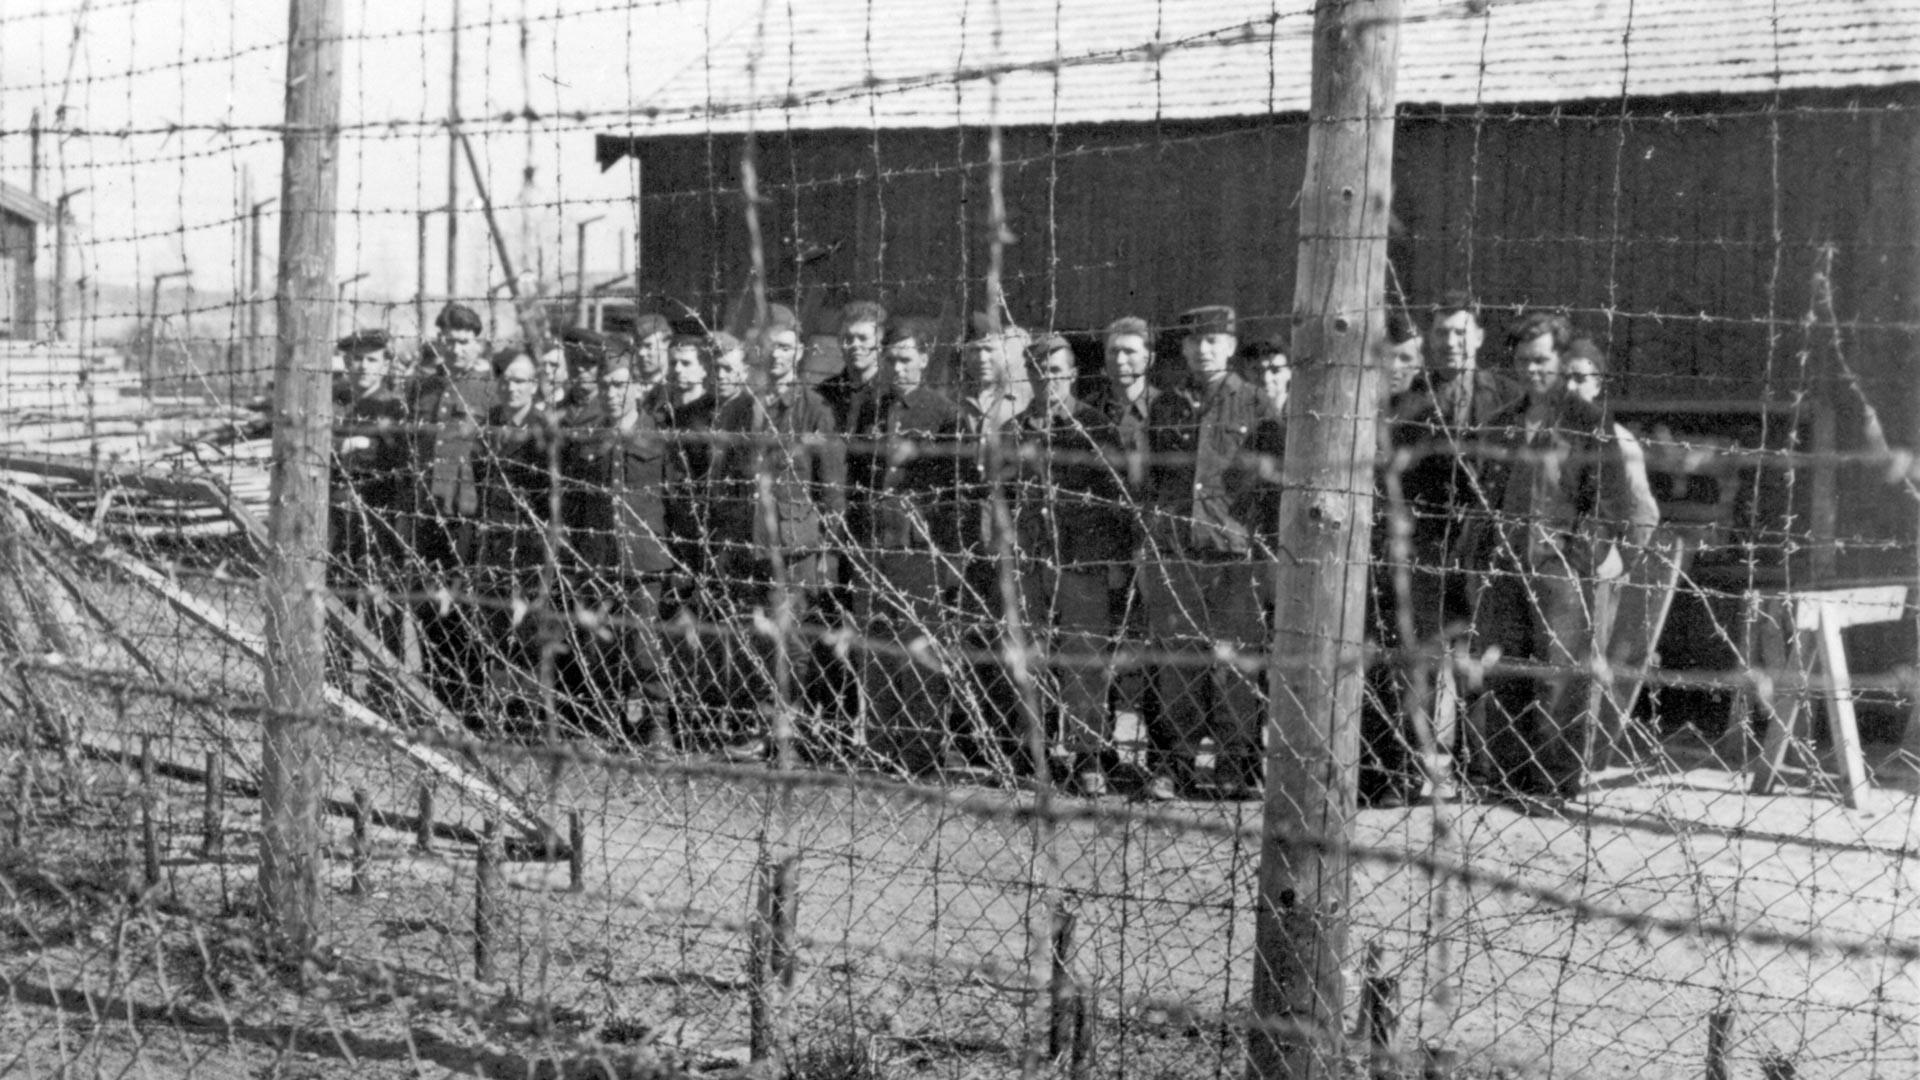 Tentara Soviet yang menjadi tawanan perang Nazi Jerman di kamp Falstad, Norwegia.